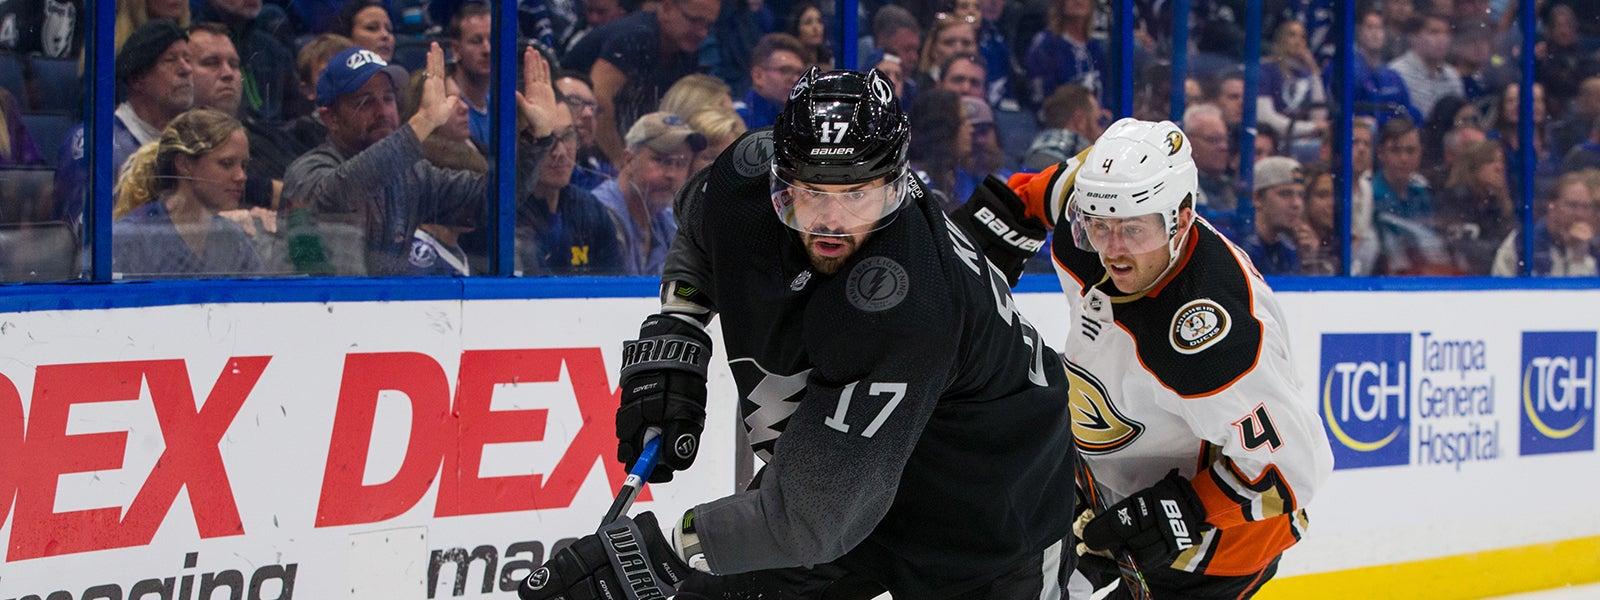 Tampa Bay Lightning vs. Anaheim Ducks